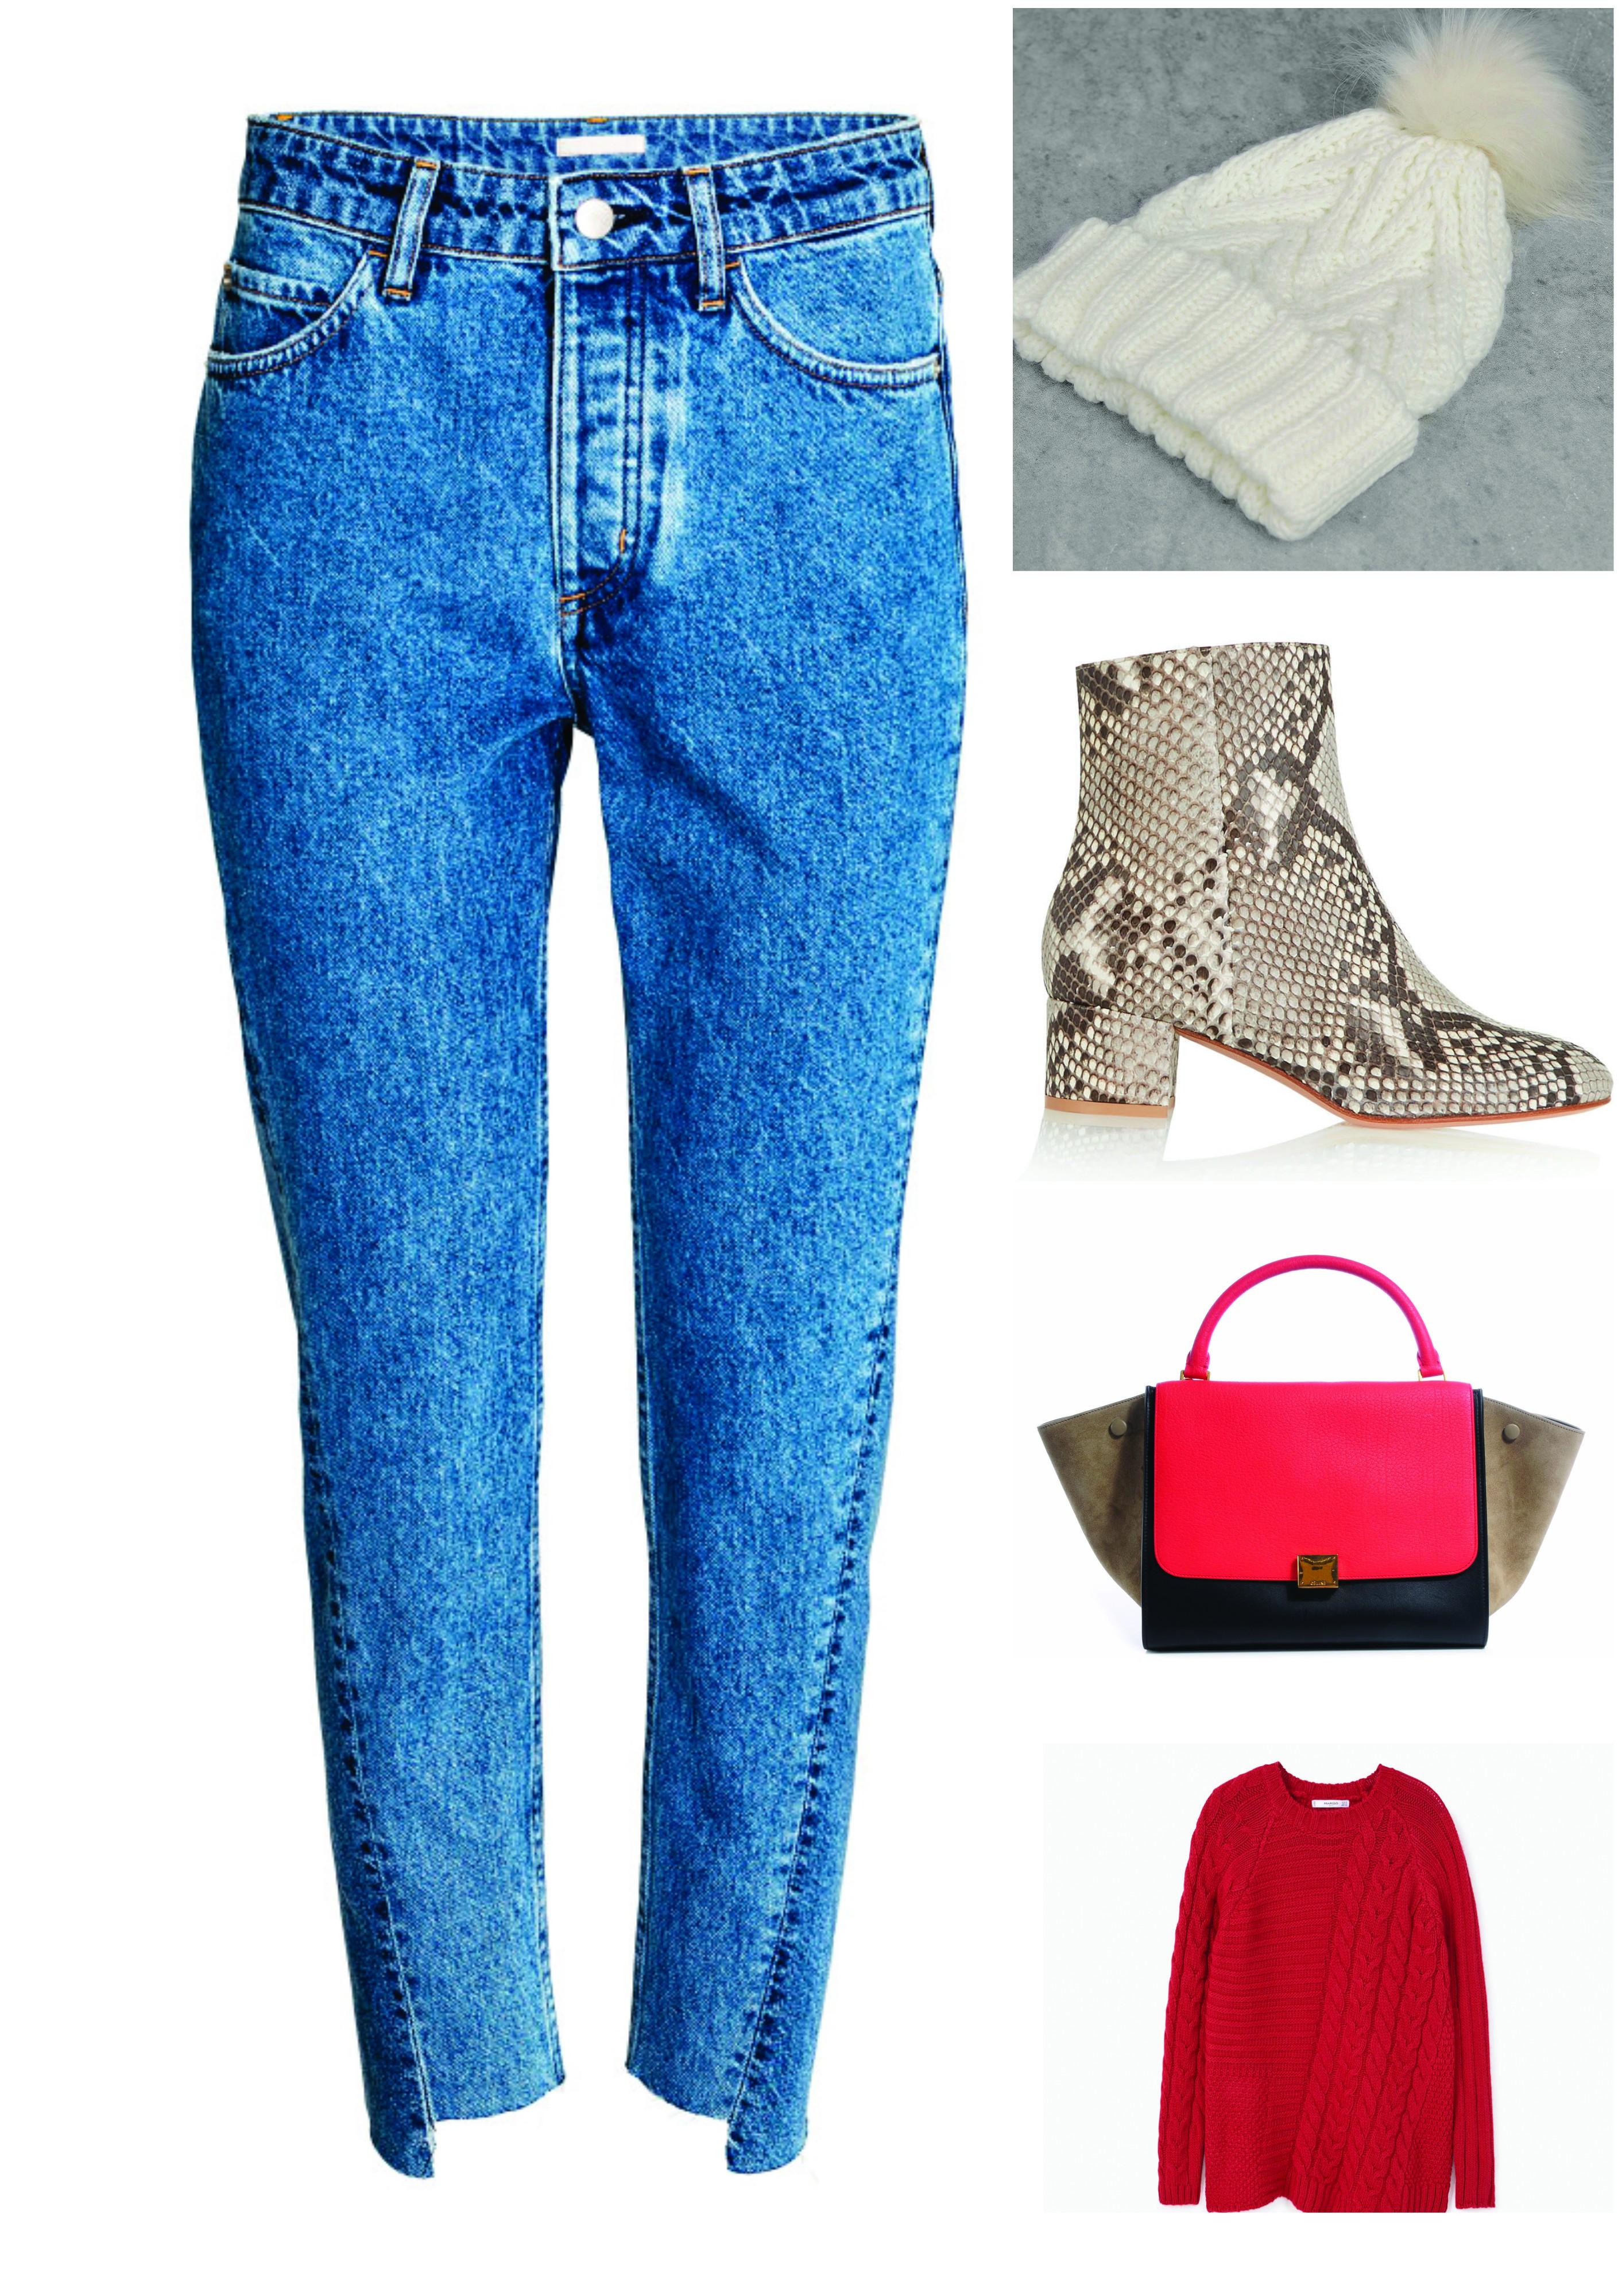 Pants: H&M, Bag: Celine, Pullover: Mango, Boots: Gianvito Rossi, Beanie: Bershka